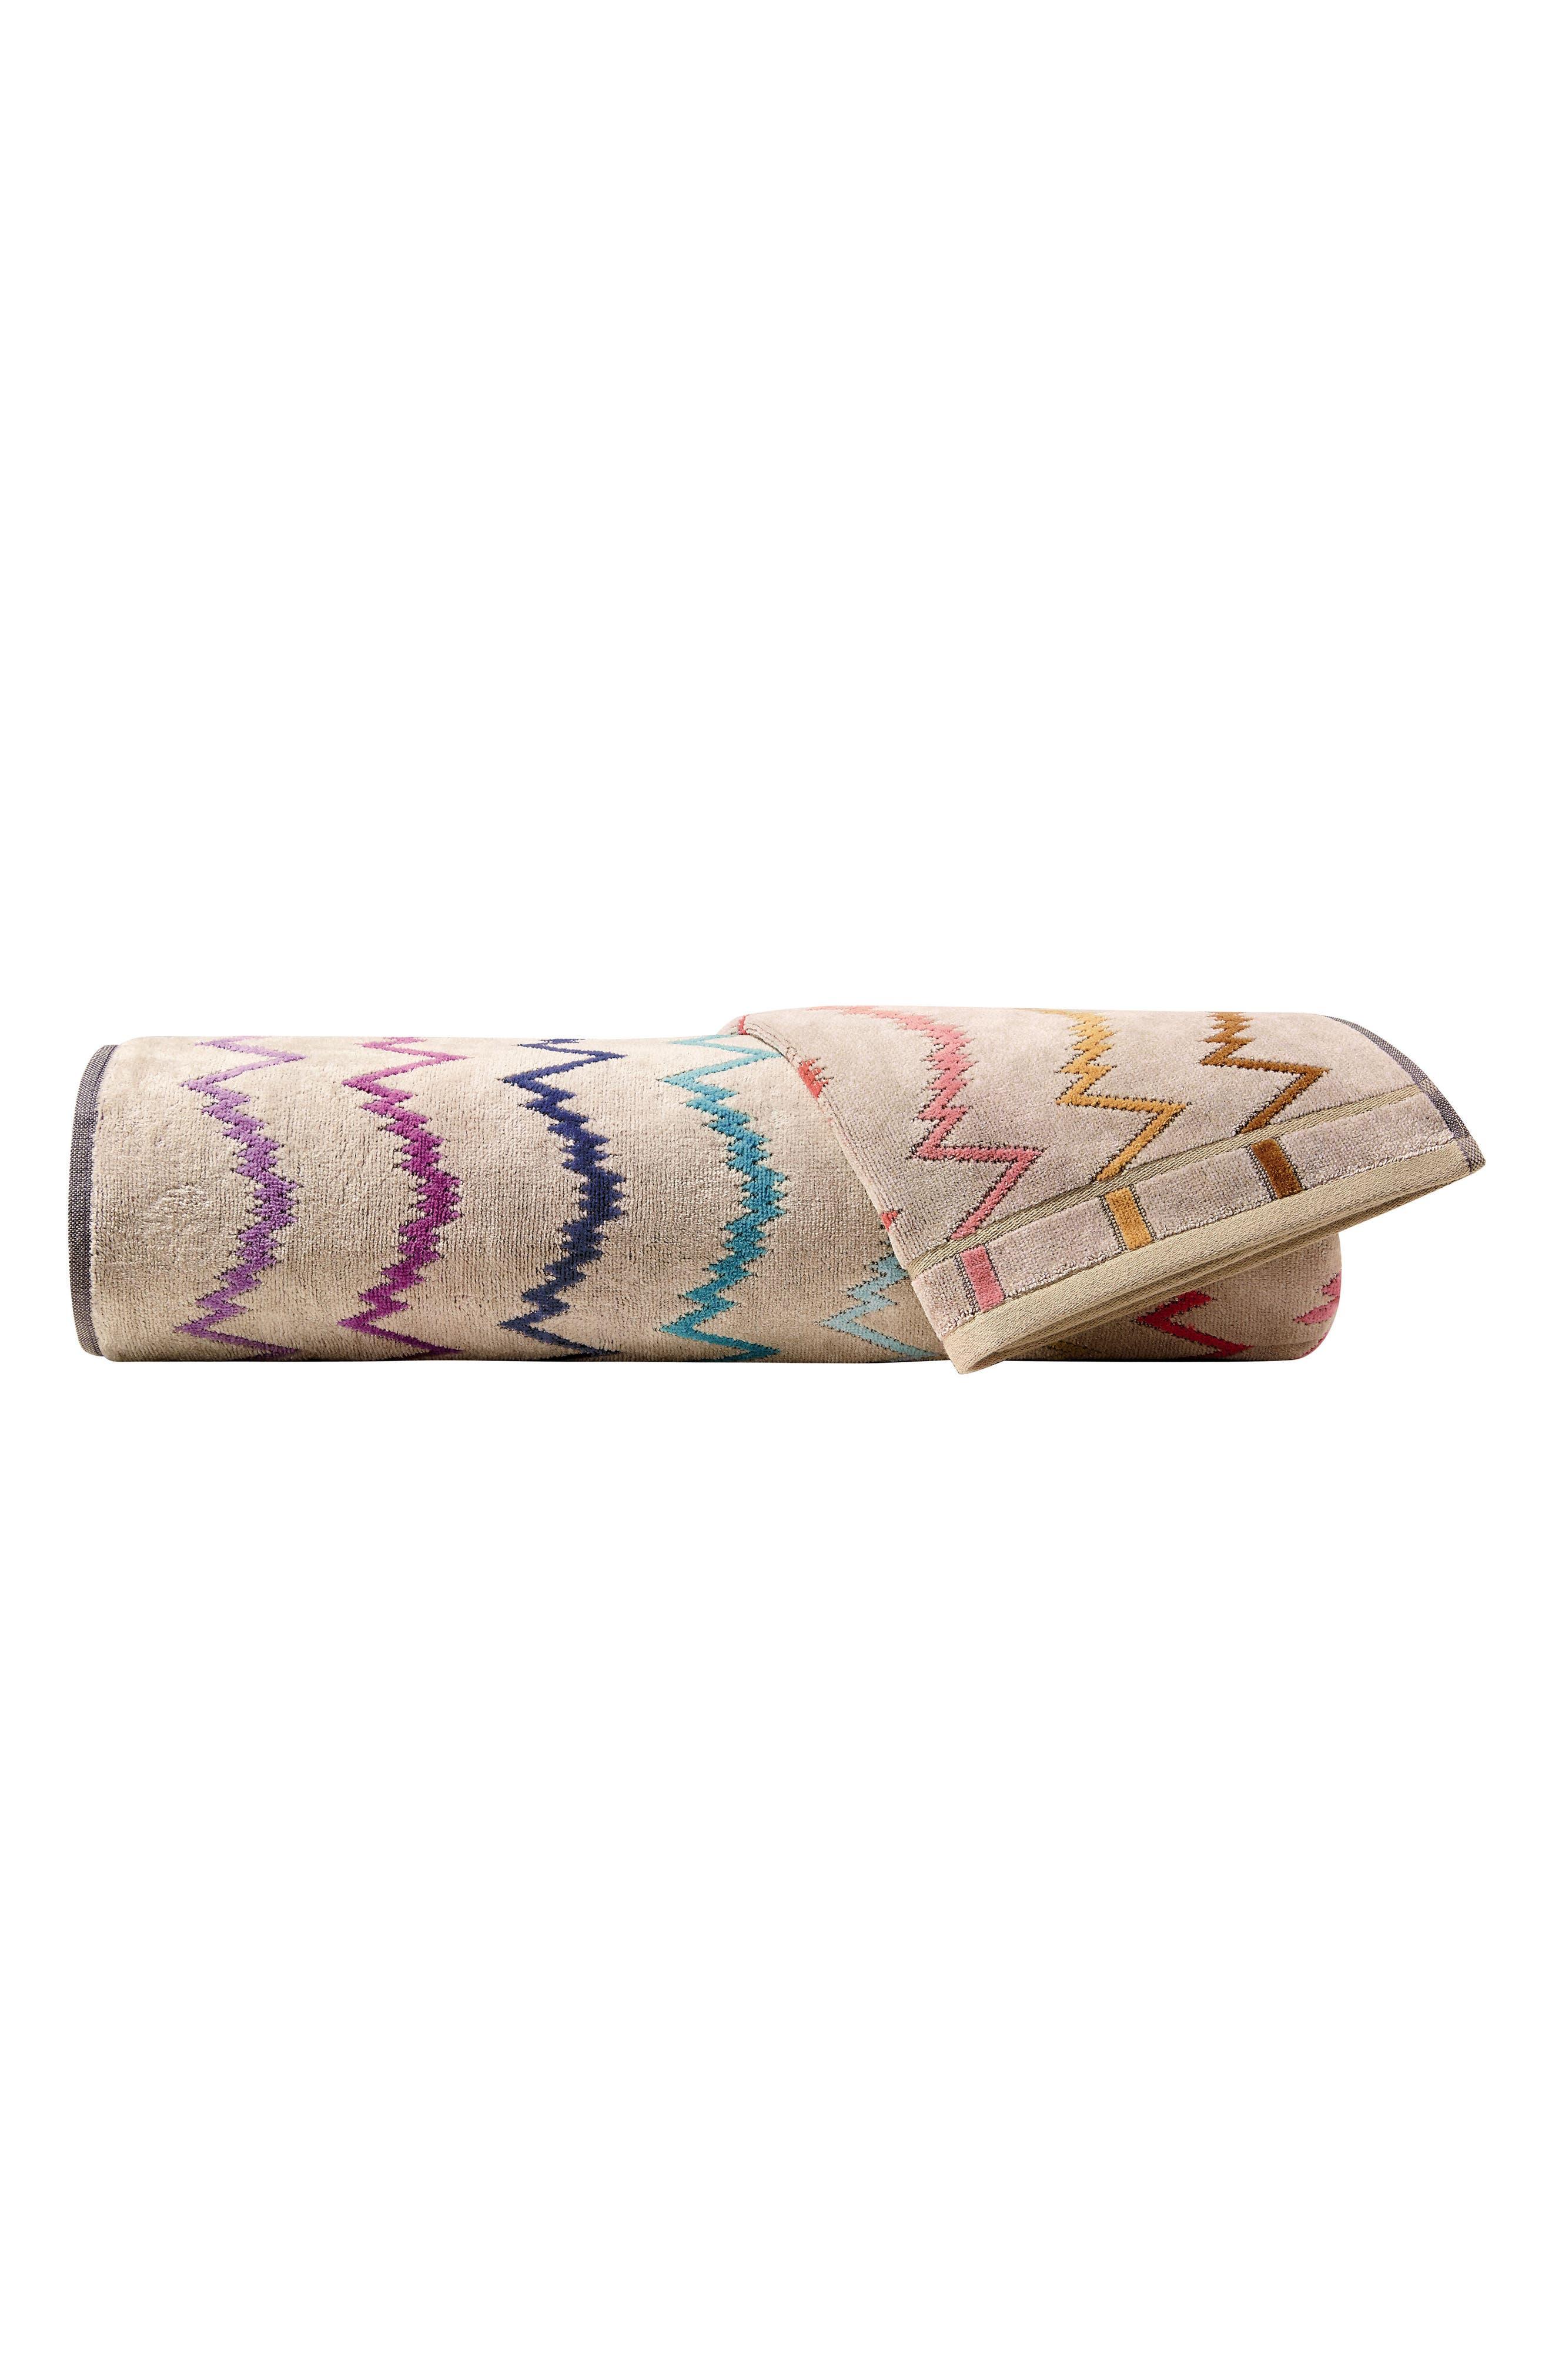 MissoniHome Vera Hand Towel